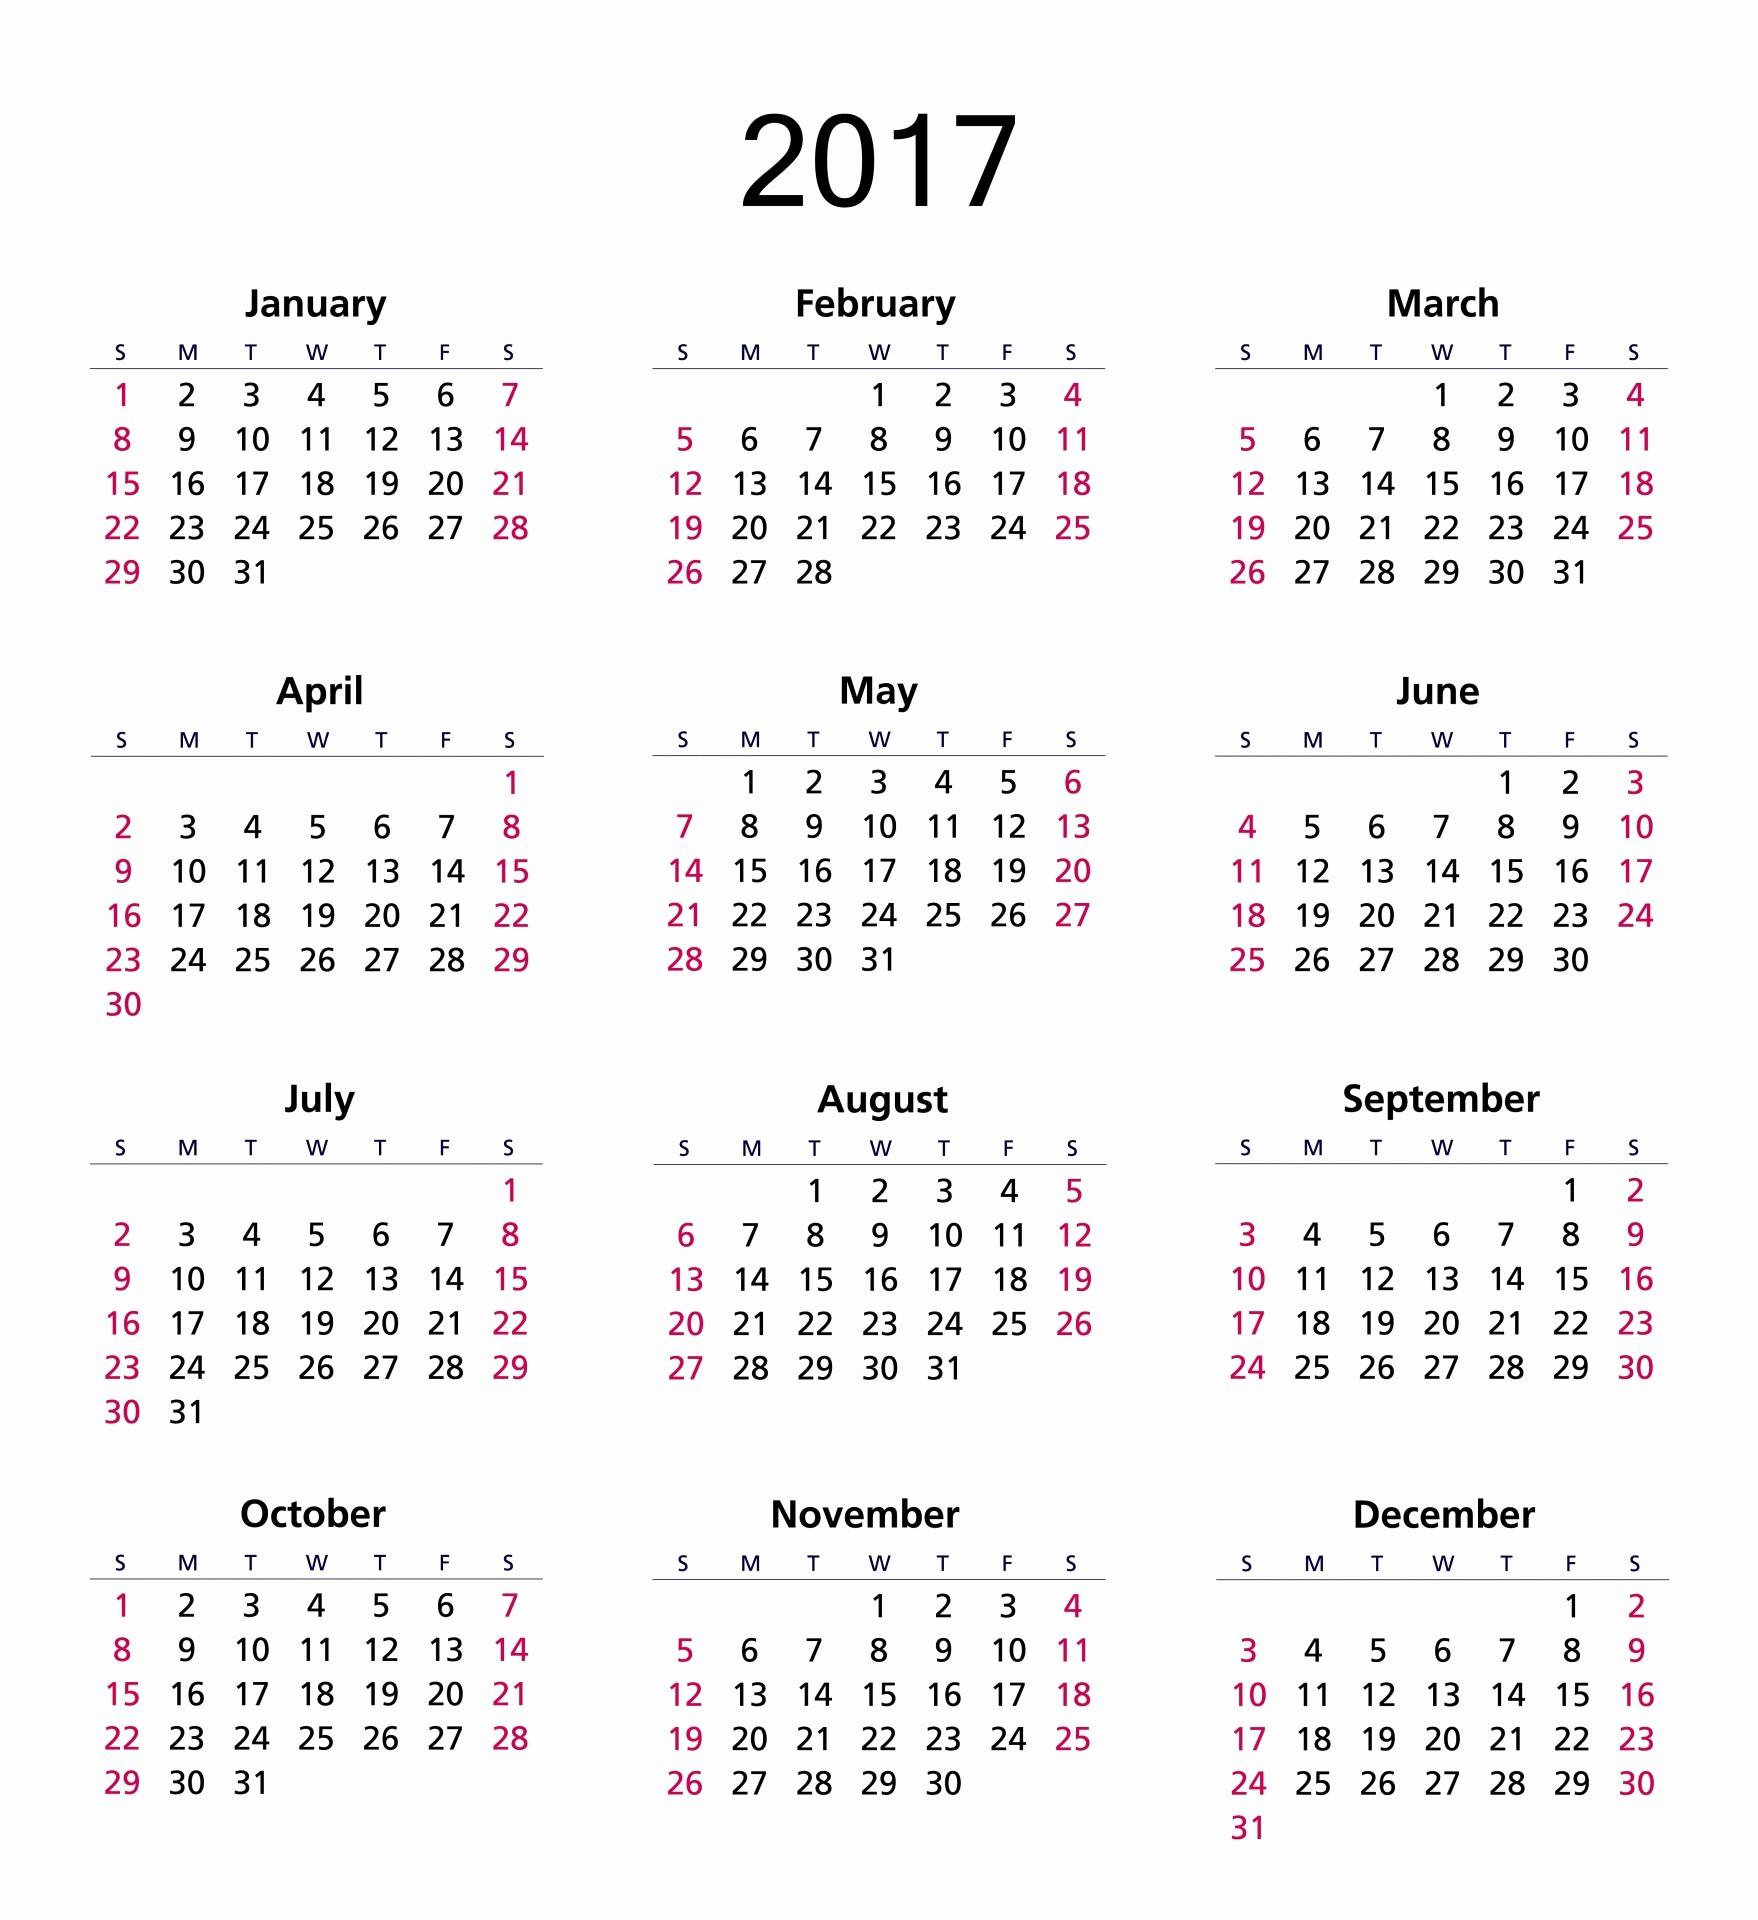 Free 12 Month Calendar 2017 Fresh 2017 Calendar Free Stock Public Domain